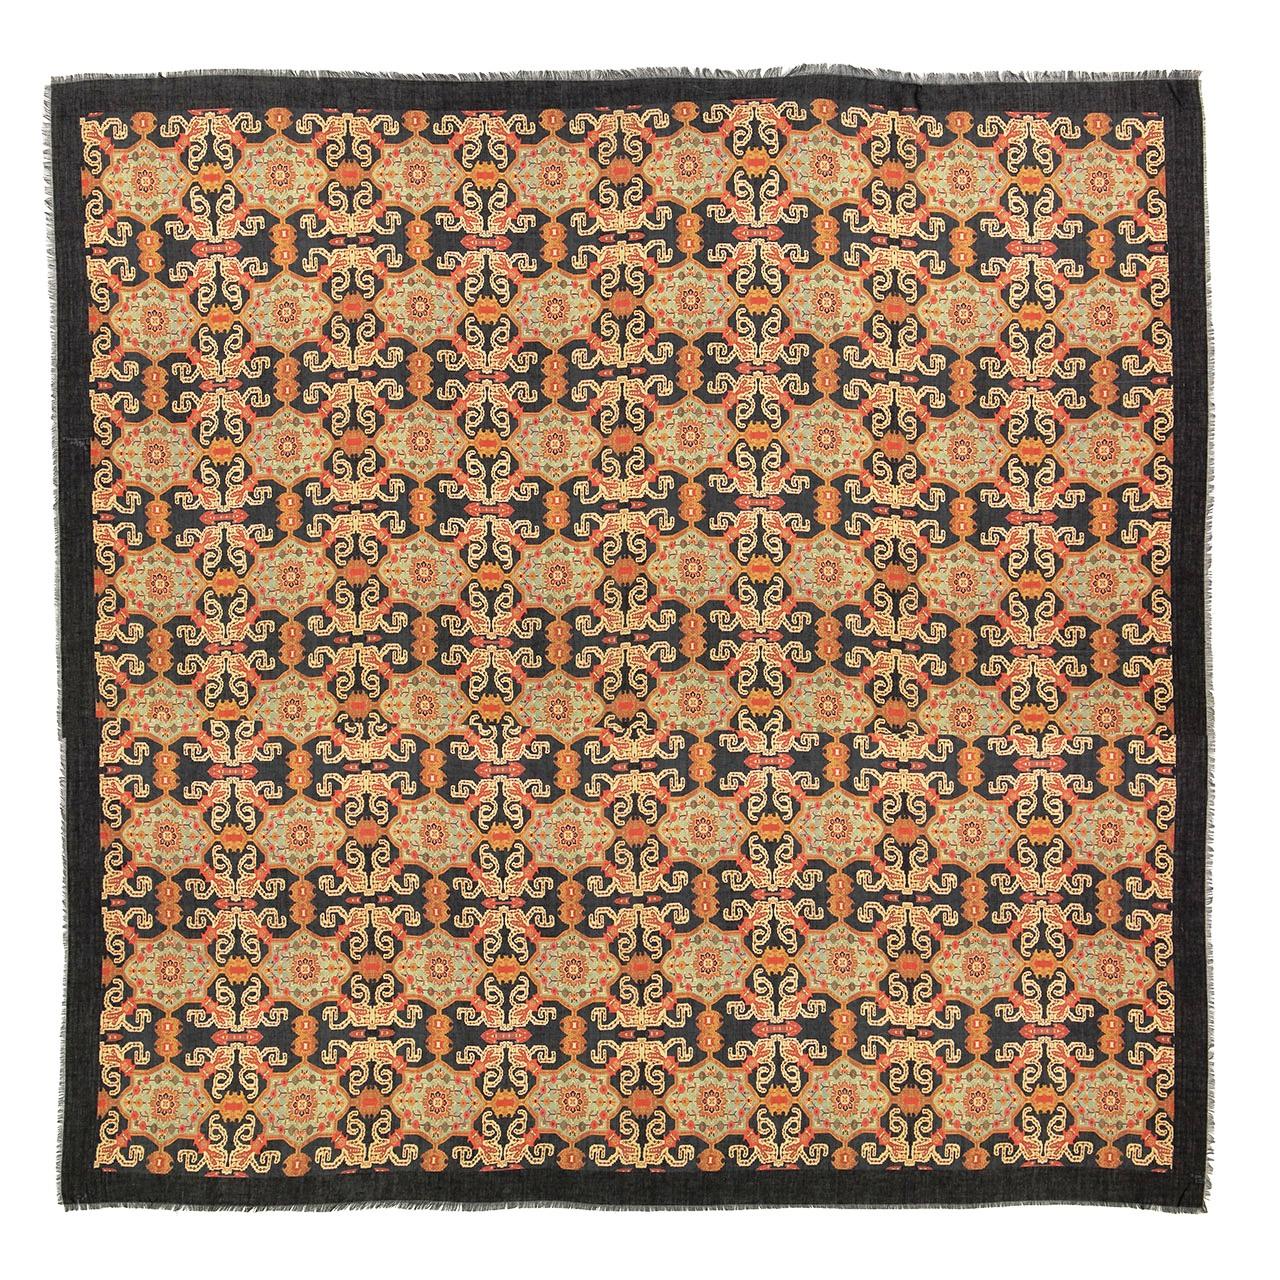 تصویر روسری زنانه طرح فرش کد 04